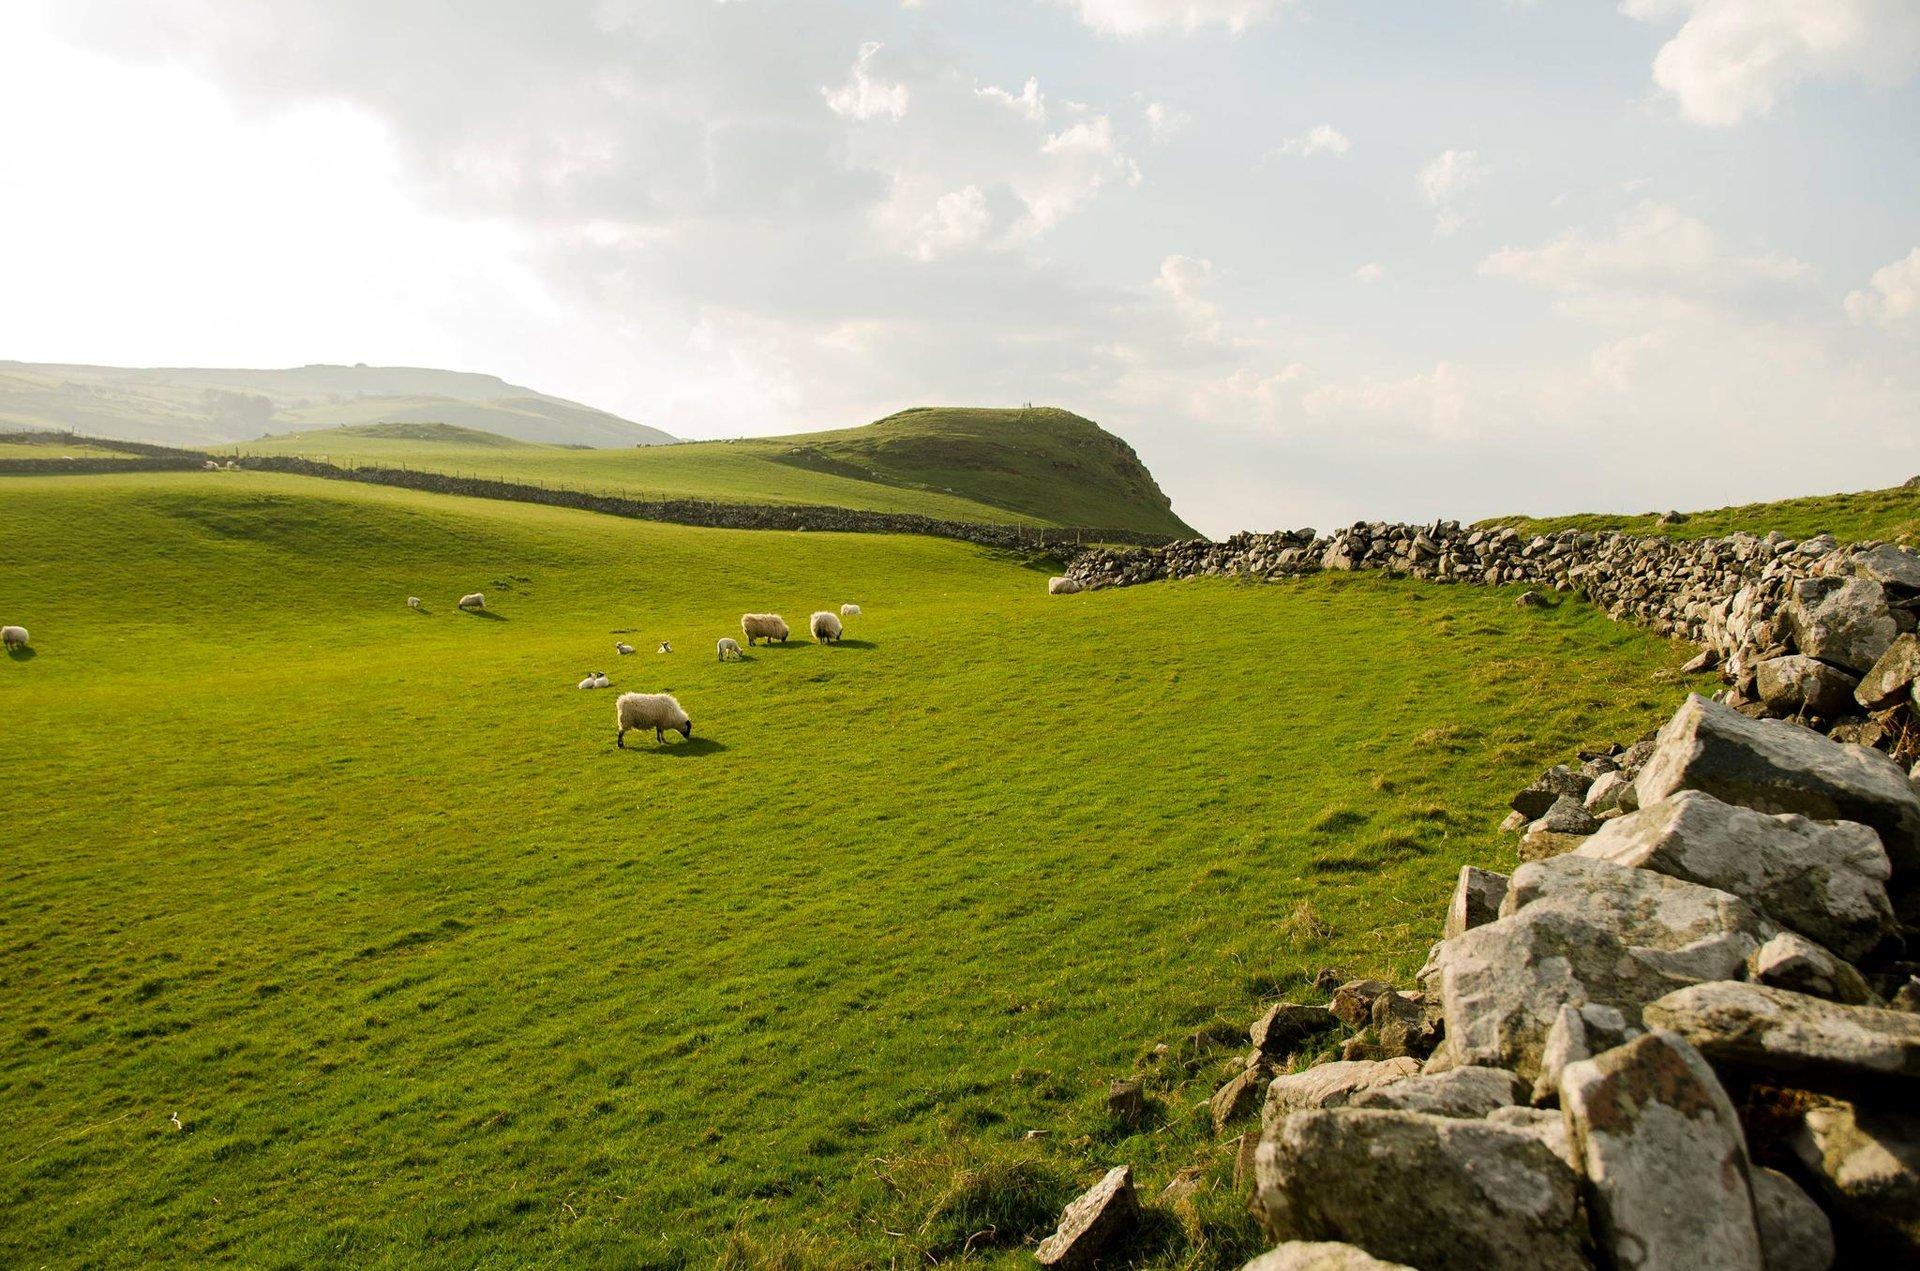 northern ireland sky grass sheep stones northern ireland 1920x1271